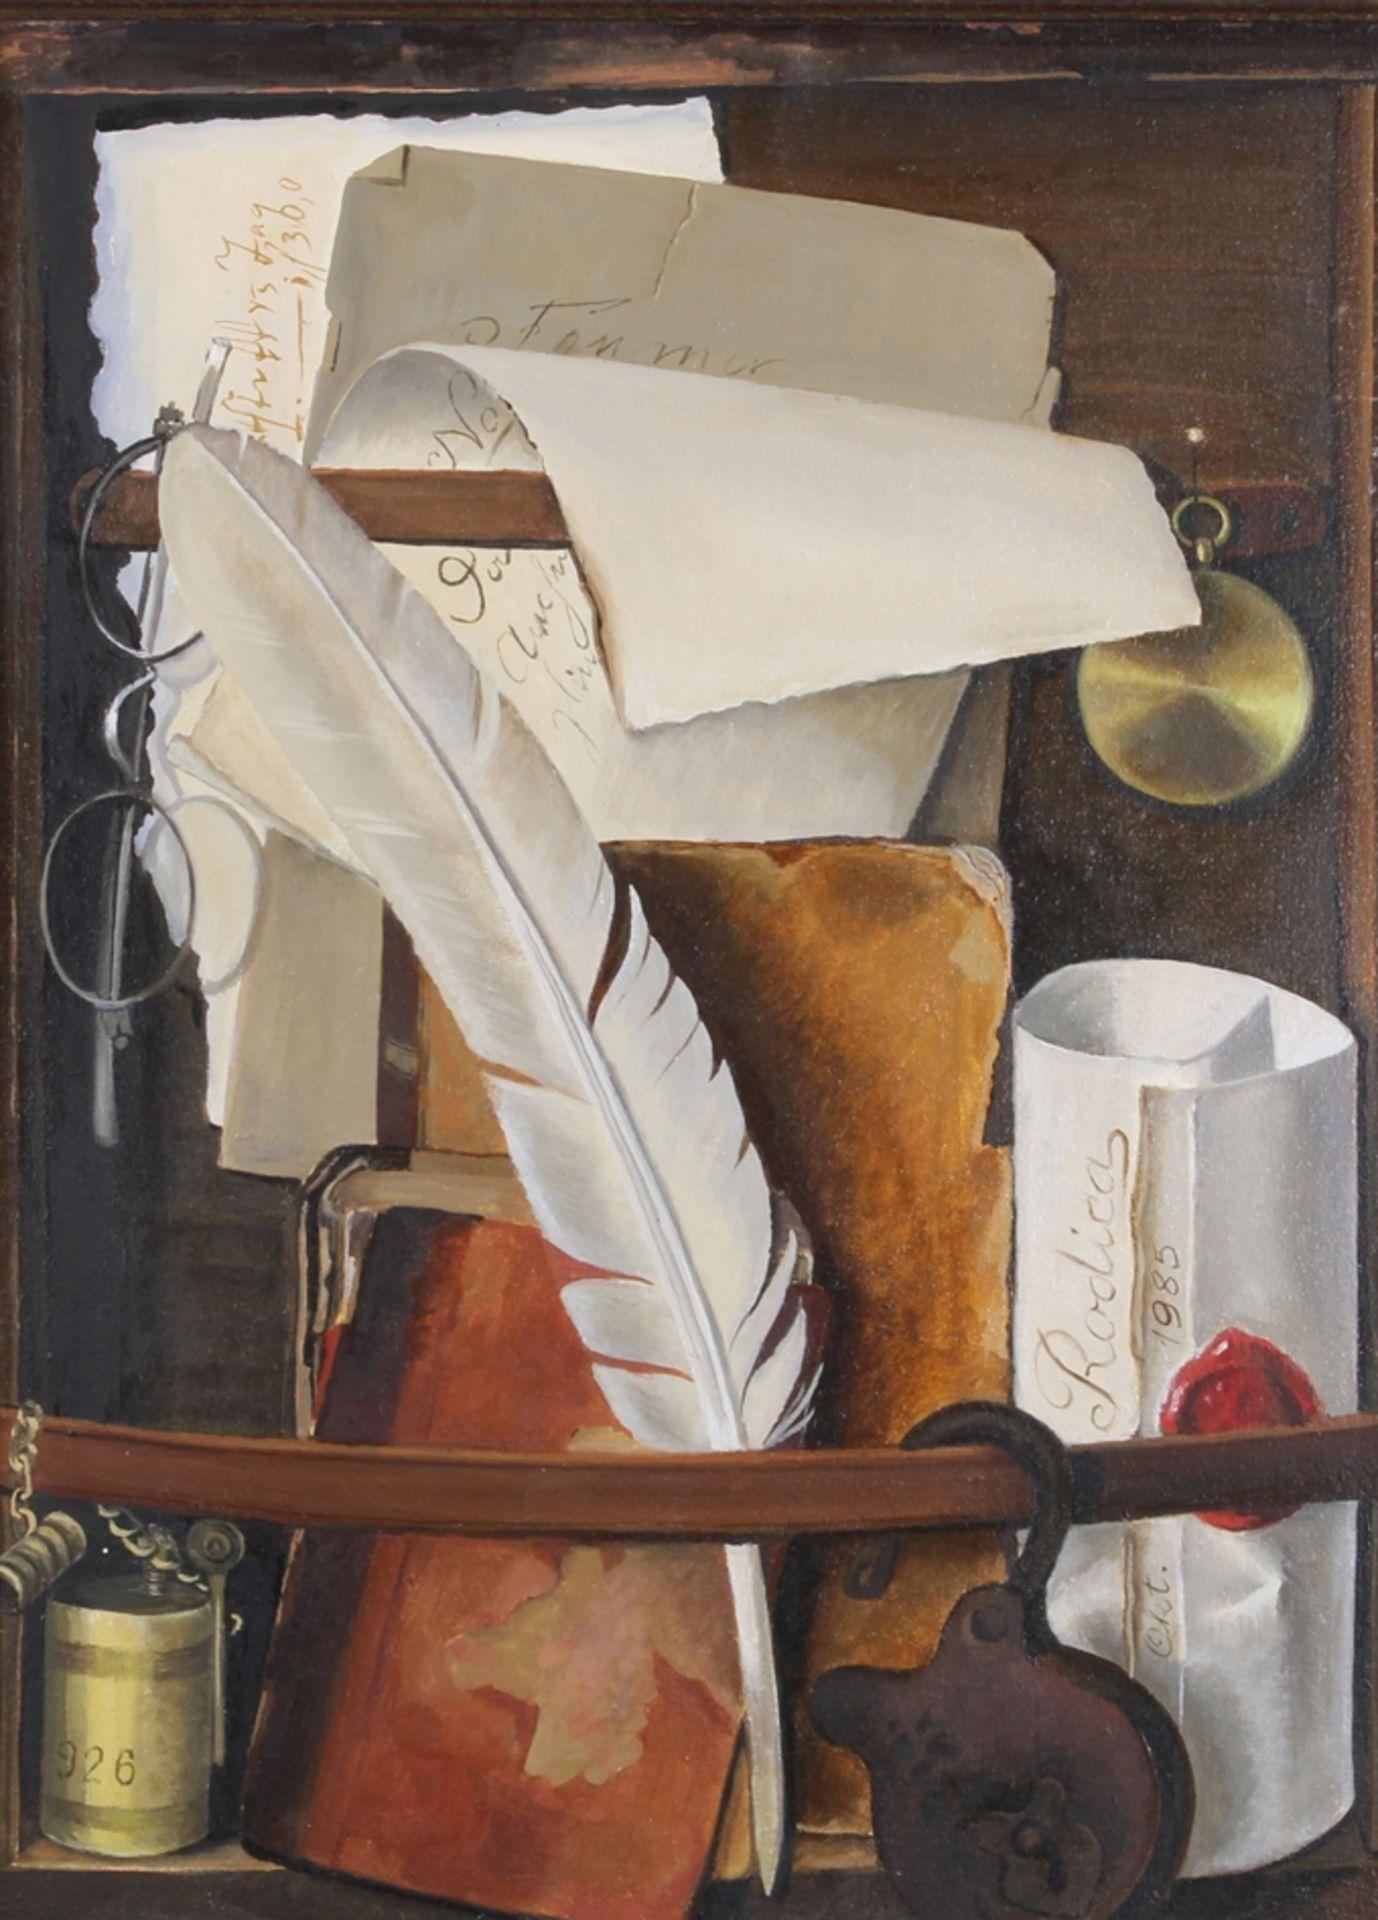 Keyserling, Rodica von (geb. 1945),